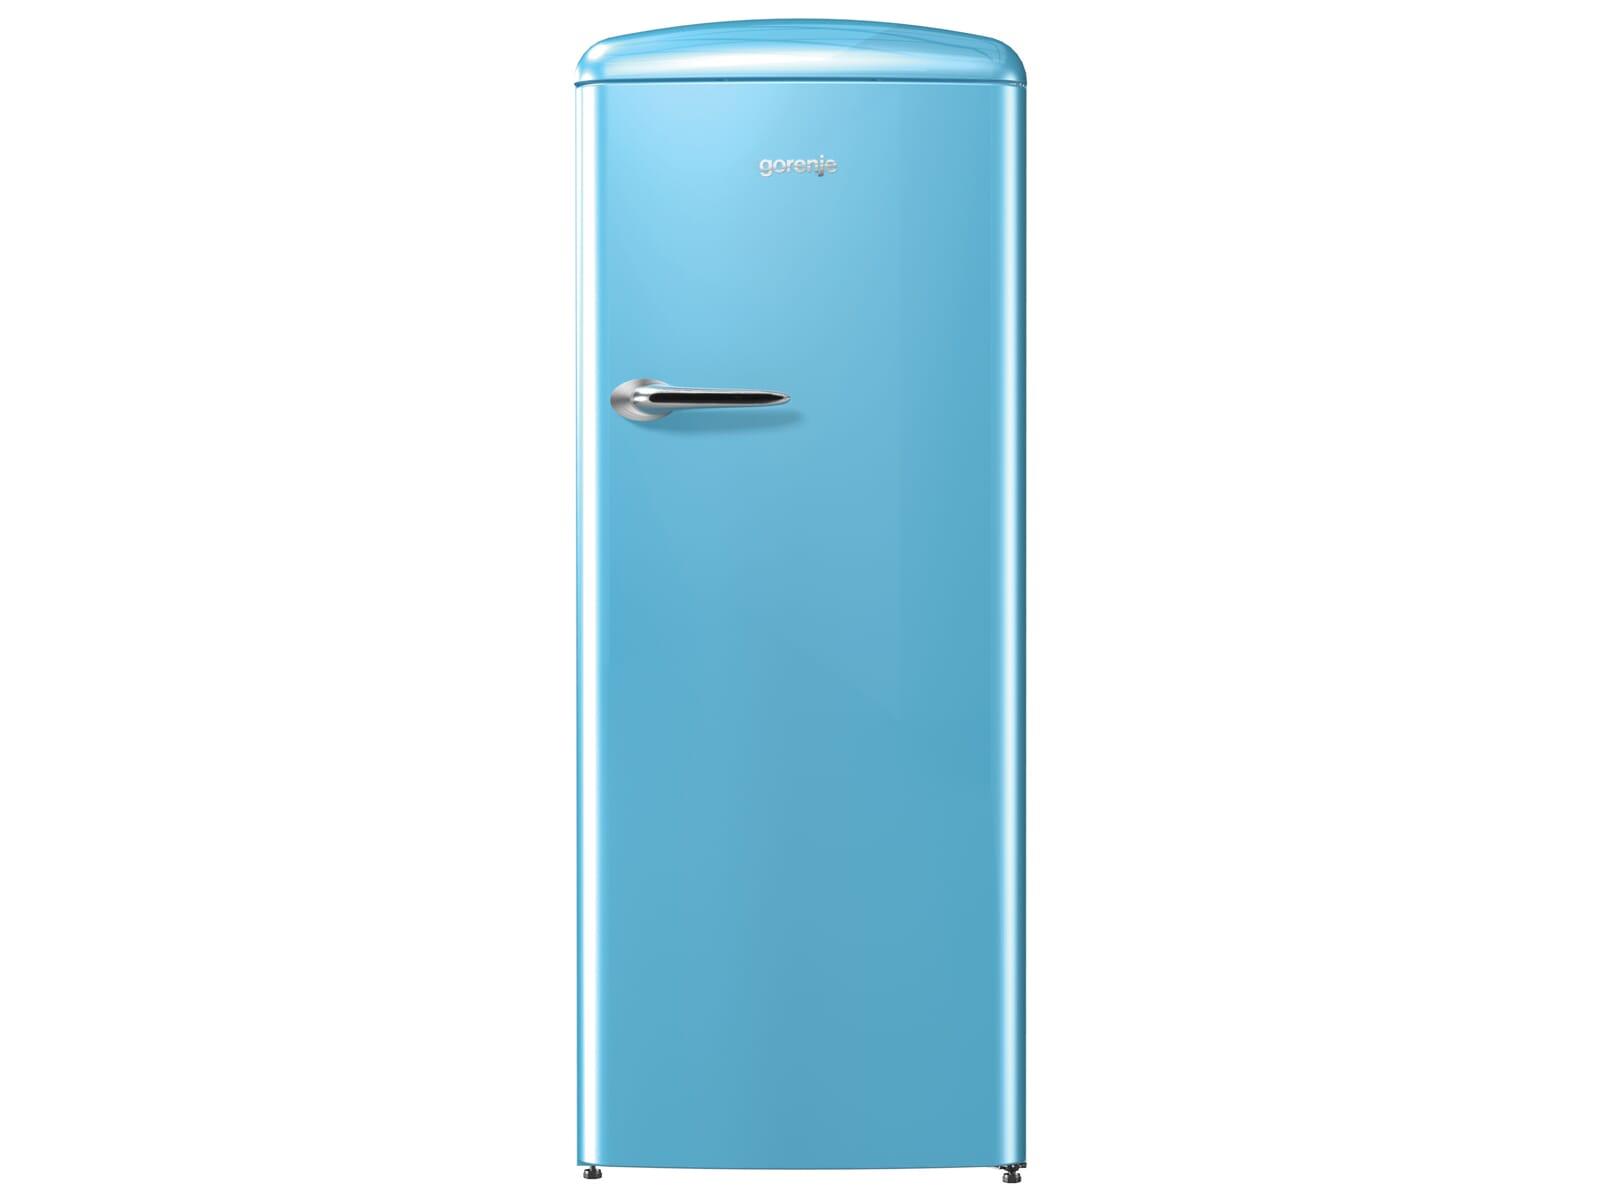 Kühlschrank Nostalgie : Kühlschrank nostalgie amerikanischer nostalgie kühlschrank retro